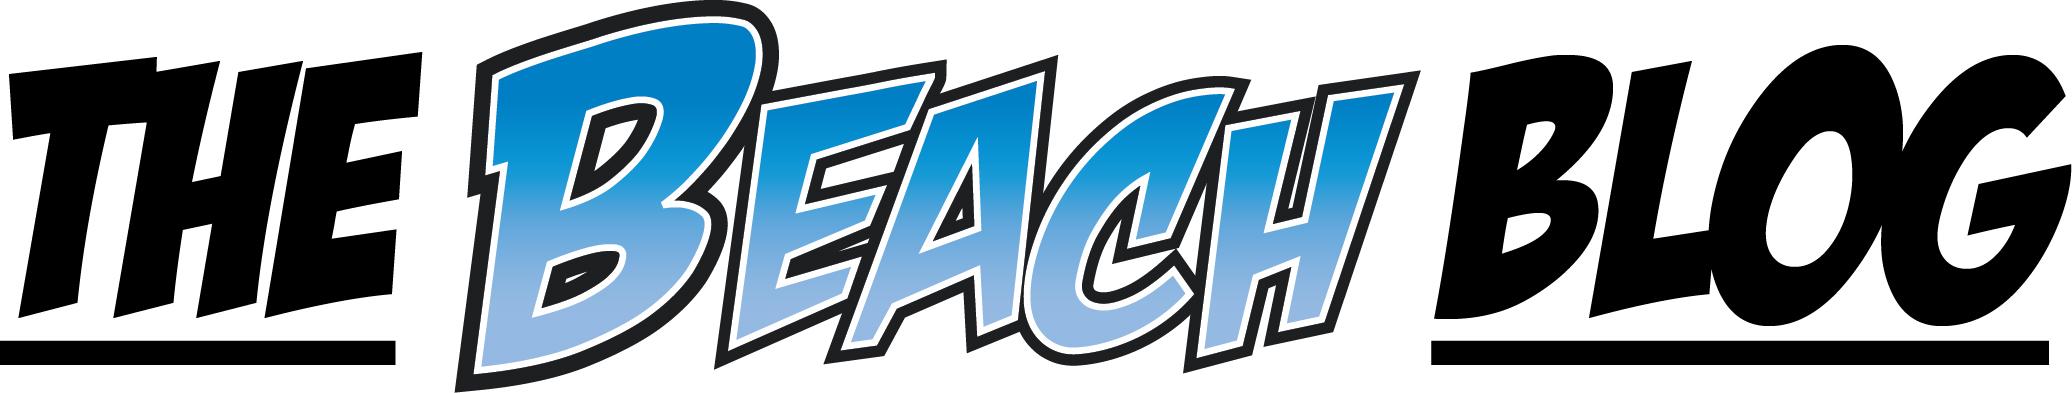 thebeachblog-logo.jpg